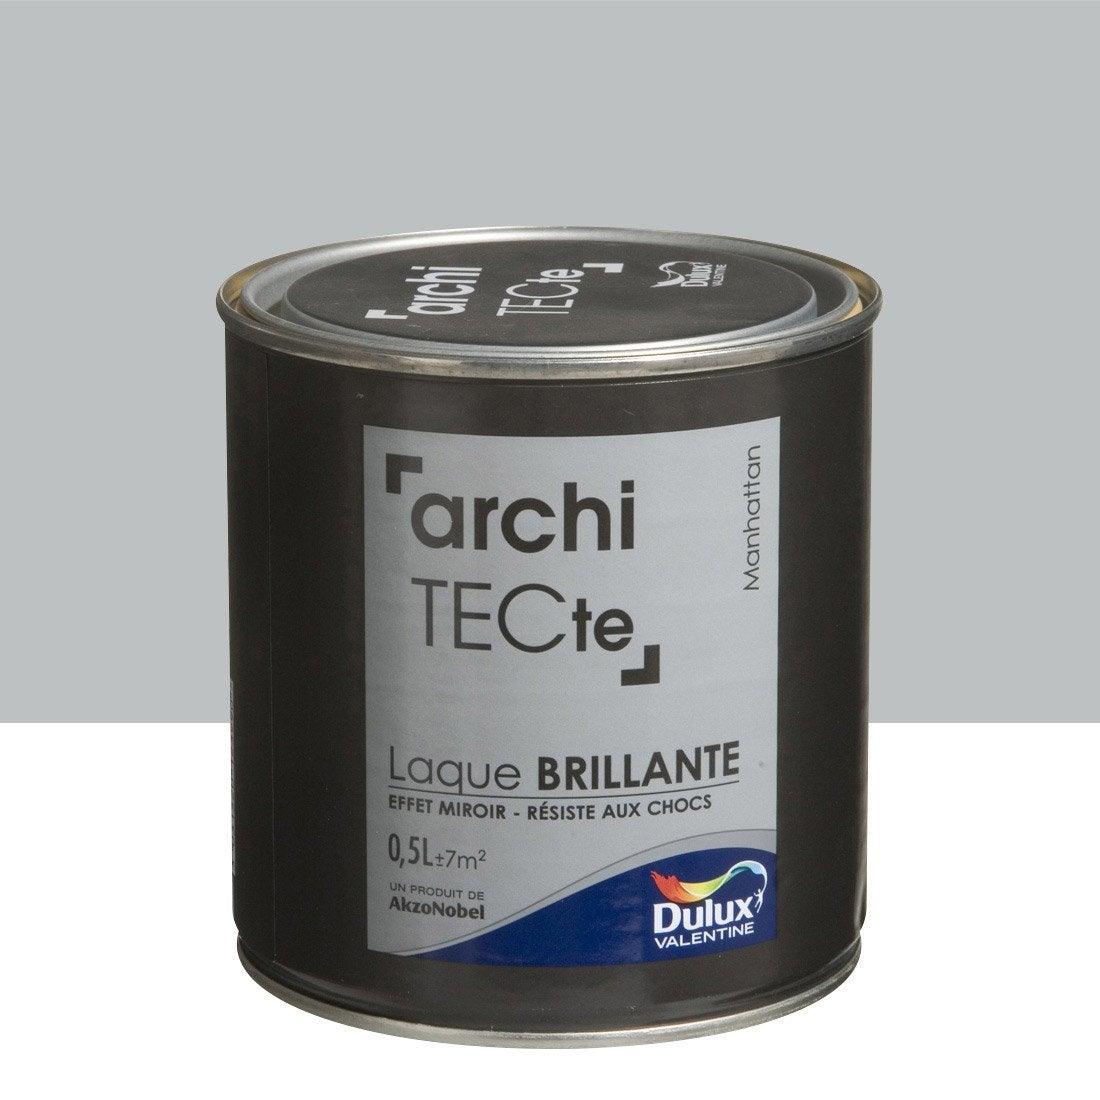 peinture grismanhattan dulux valentine architecte 0 5 l